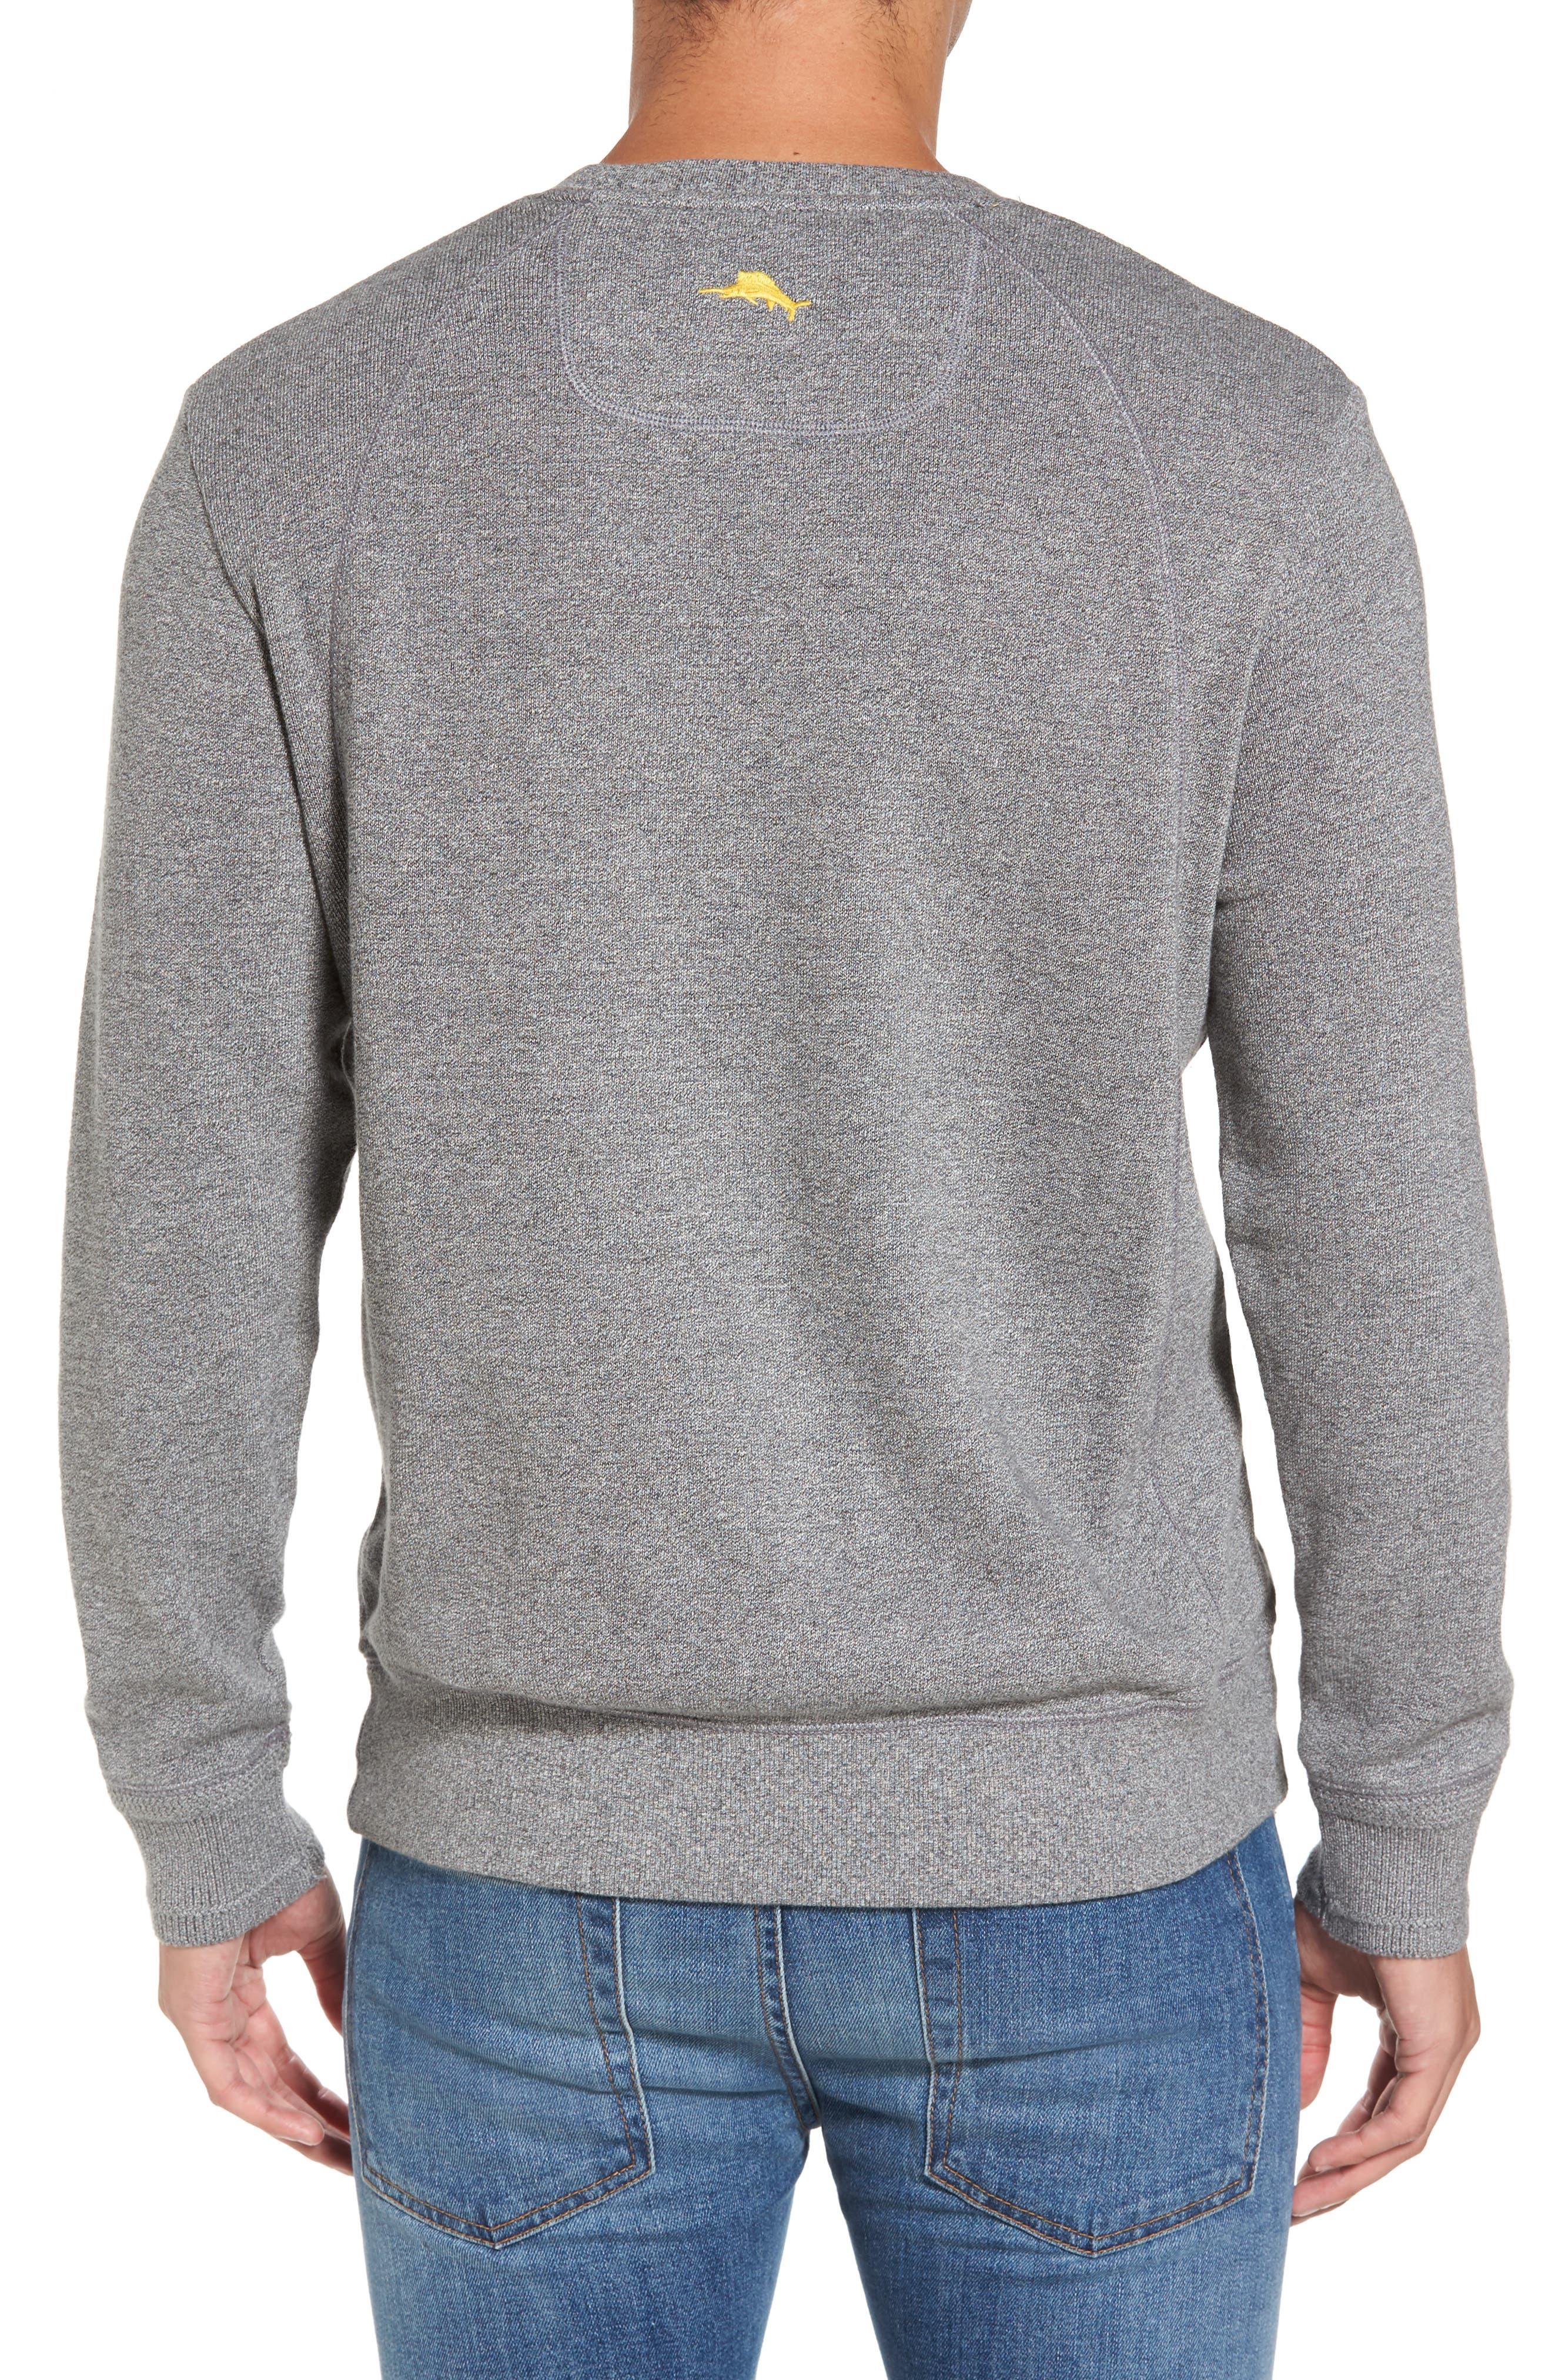 NFL Stitch of Liberty Embroidered Crewneck Sweatshirt,                             Alternate thumbnail 59, color,